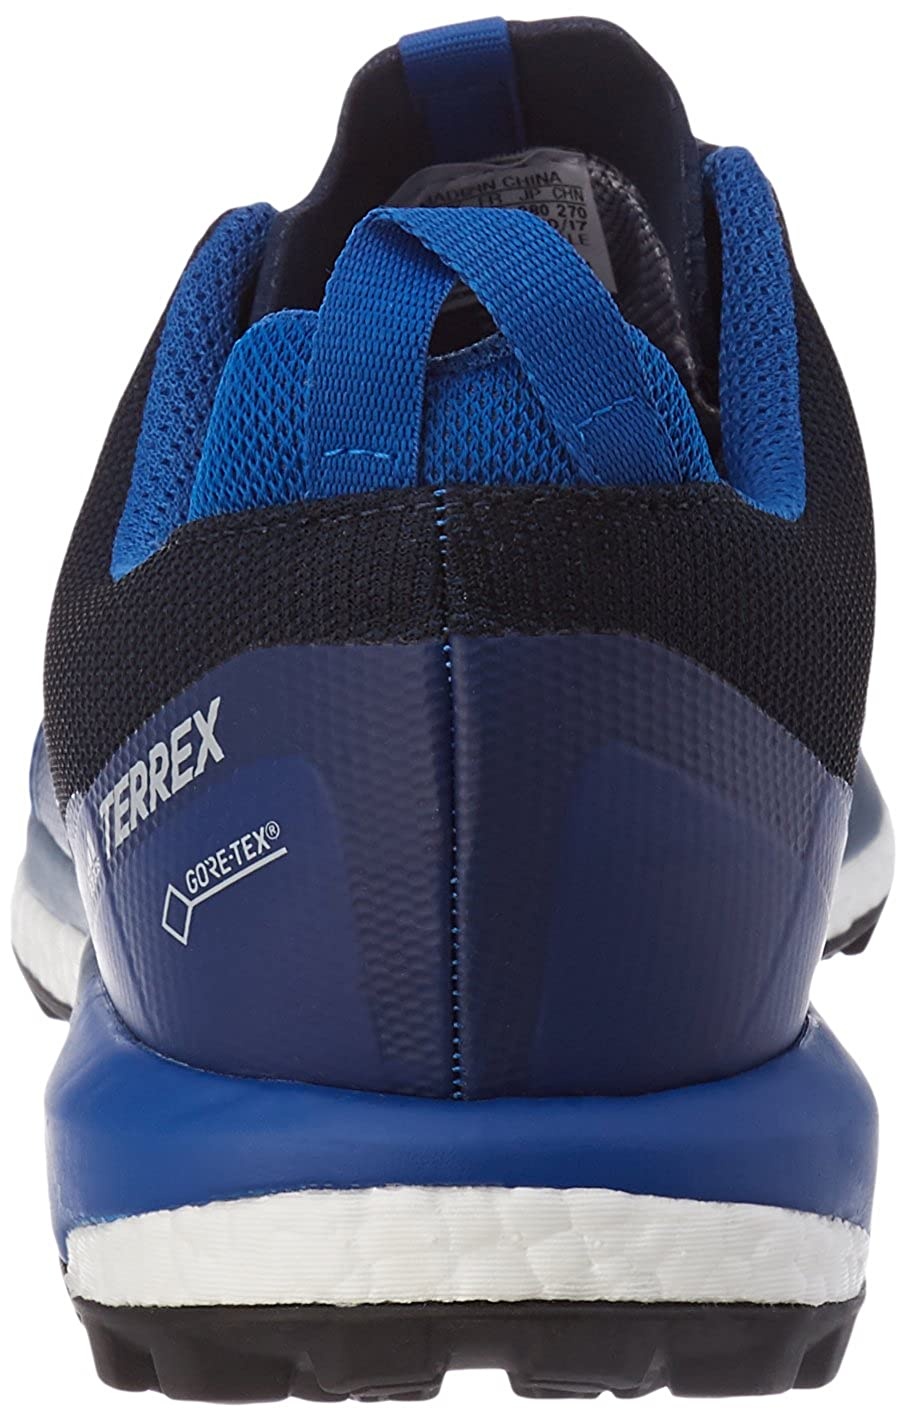 Terrex Skychaser GTX, Chaussures de Randonnée Basses Homme, Noir (Negbas/Negbas/Carbon 000), 41 1/3 EUadidas